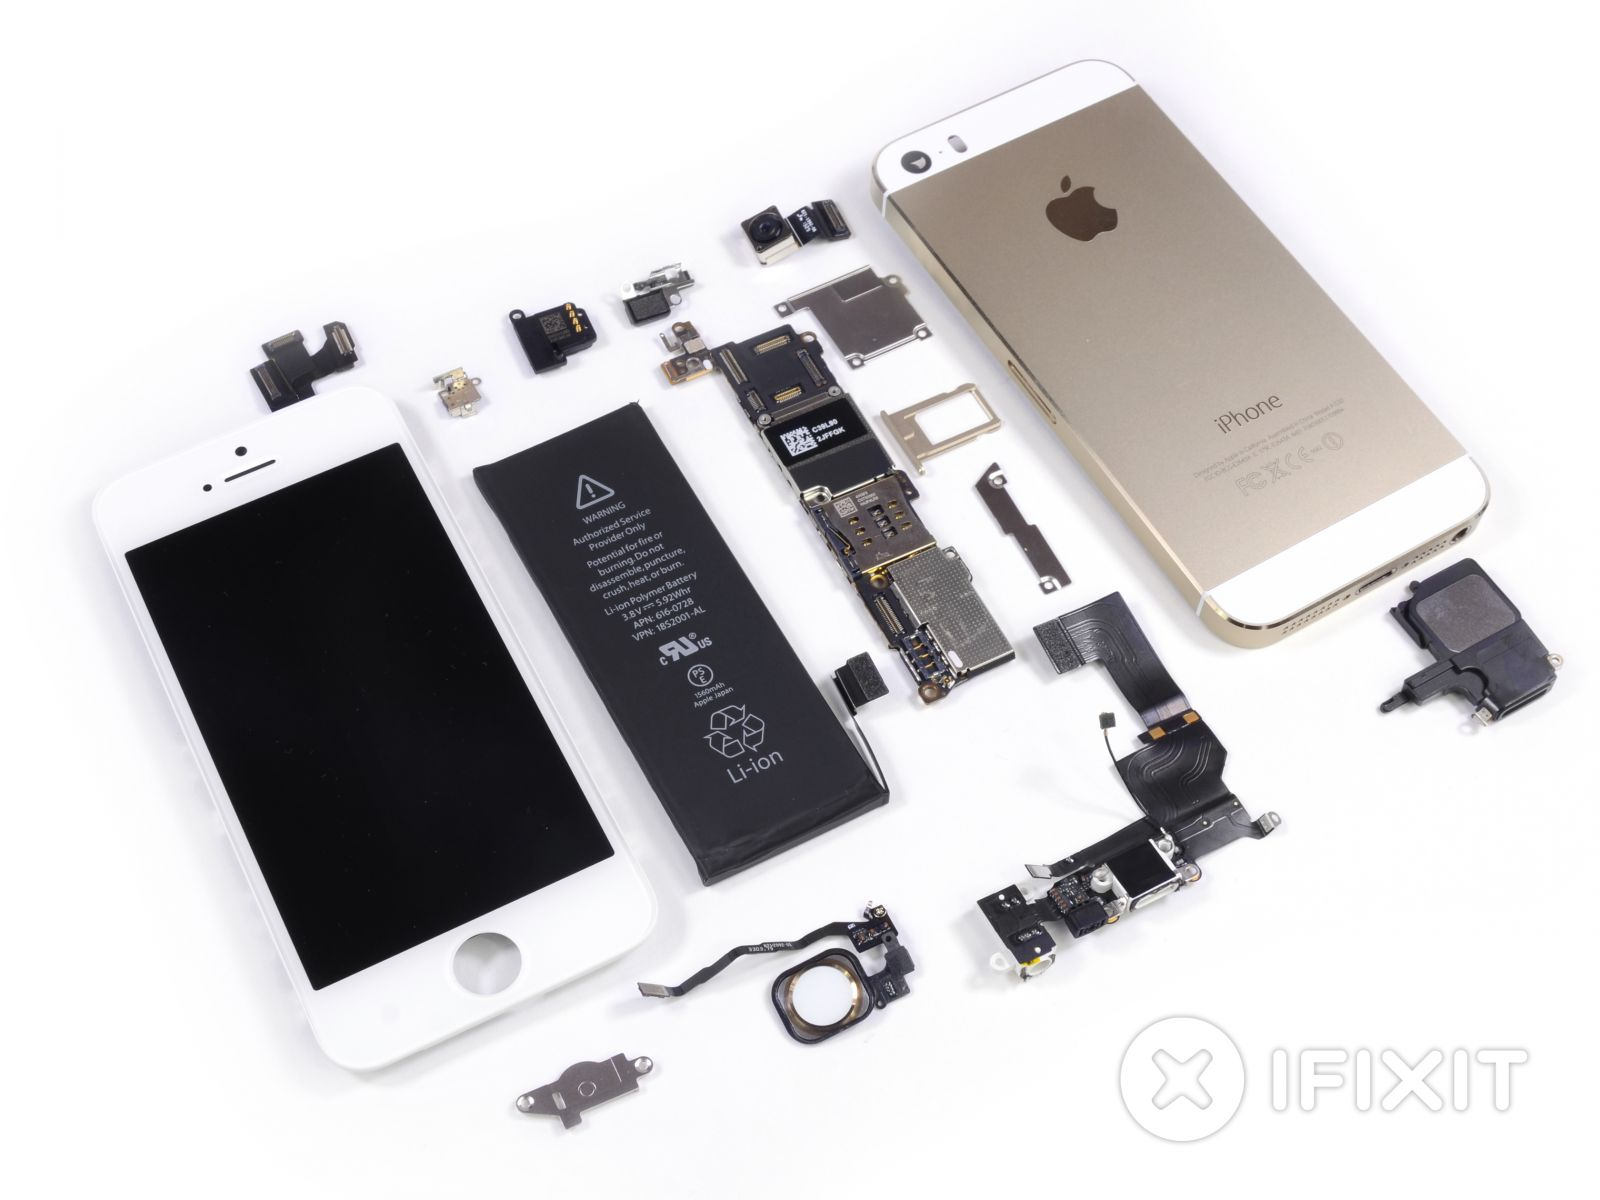 kak-razobrat-iphone-5s-01